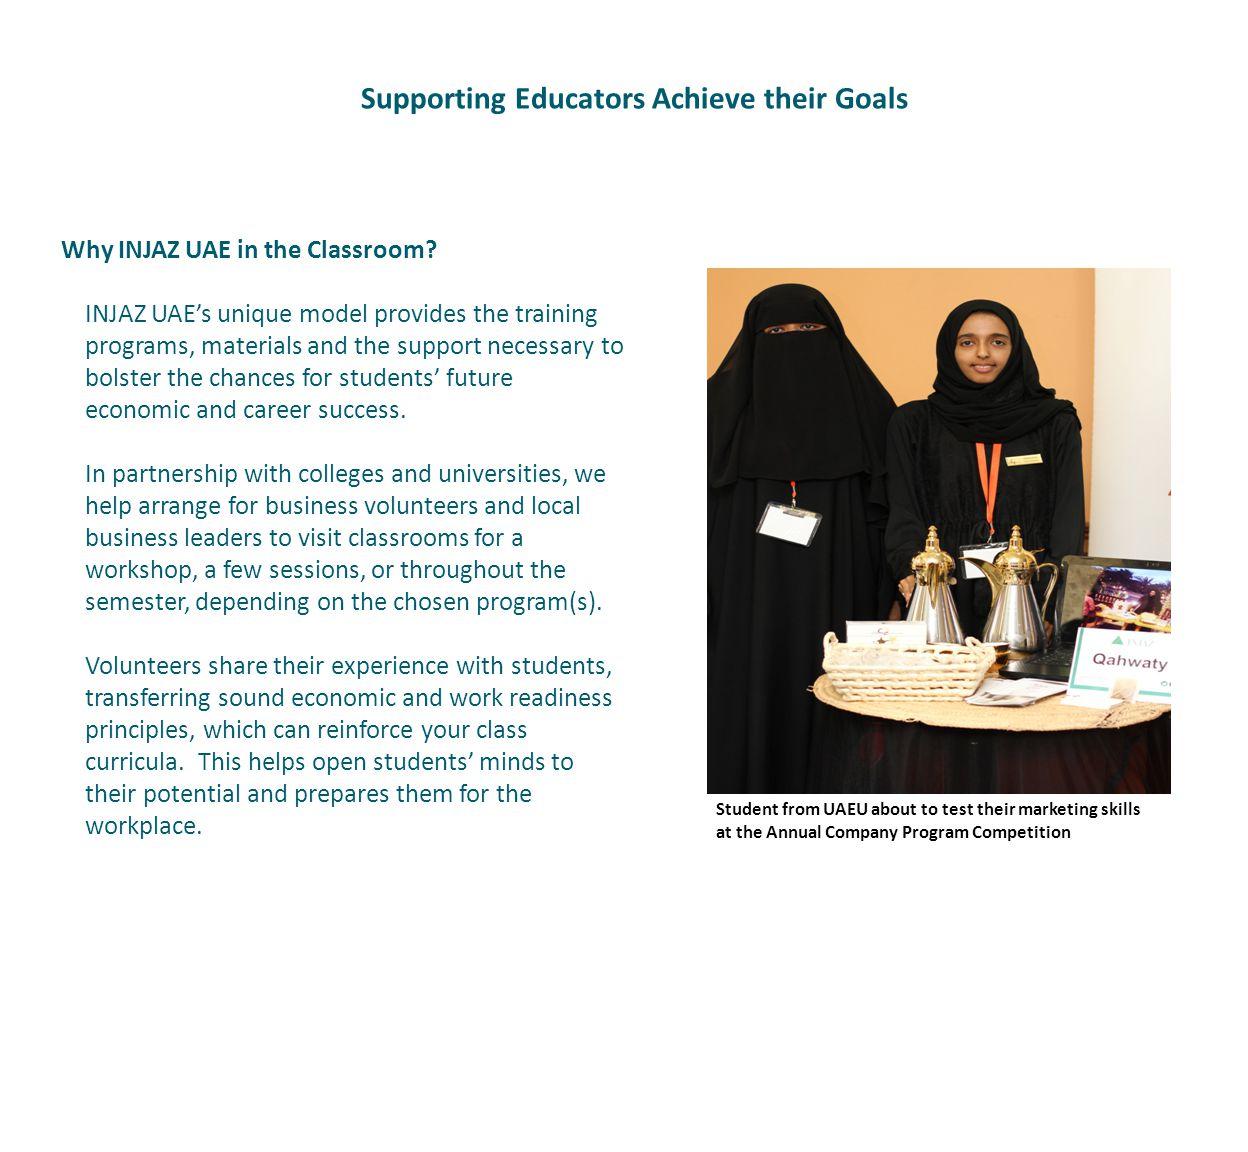 Why INJAZ UAE in the Classroom.